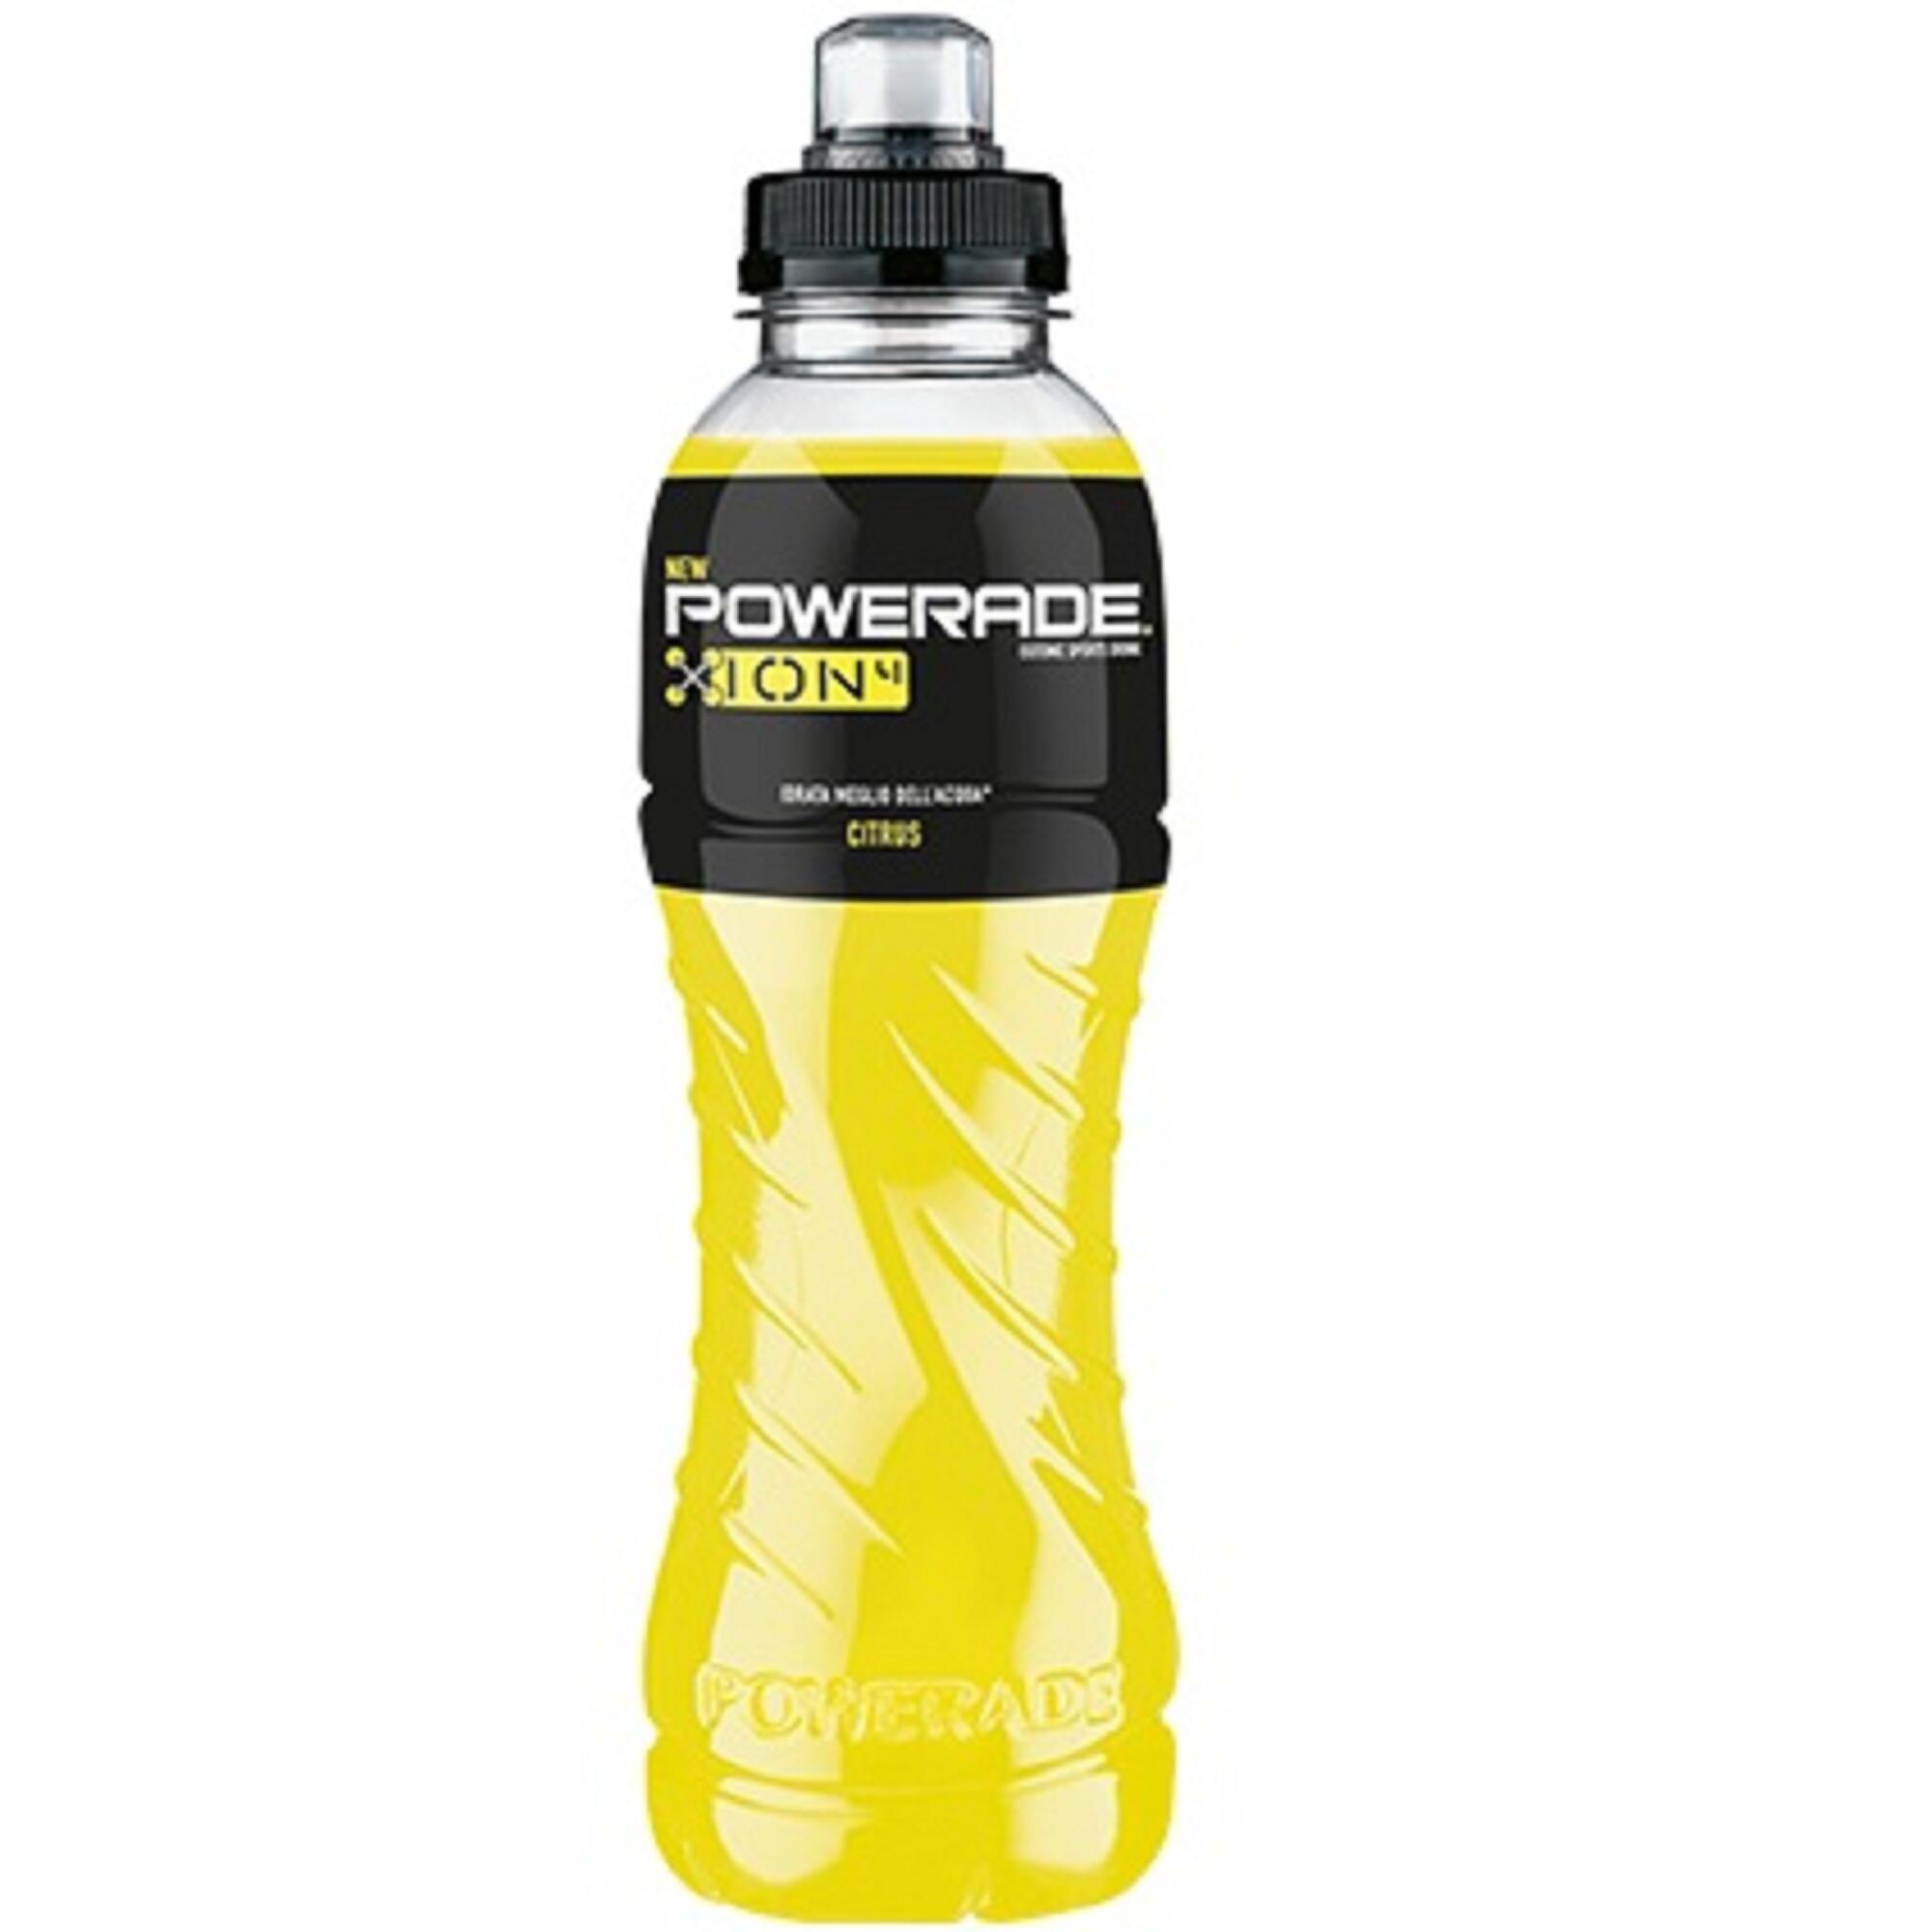 POWERADE. Bevanda Citrus Powerade 500ml